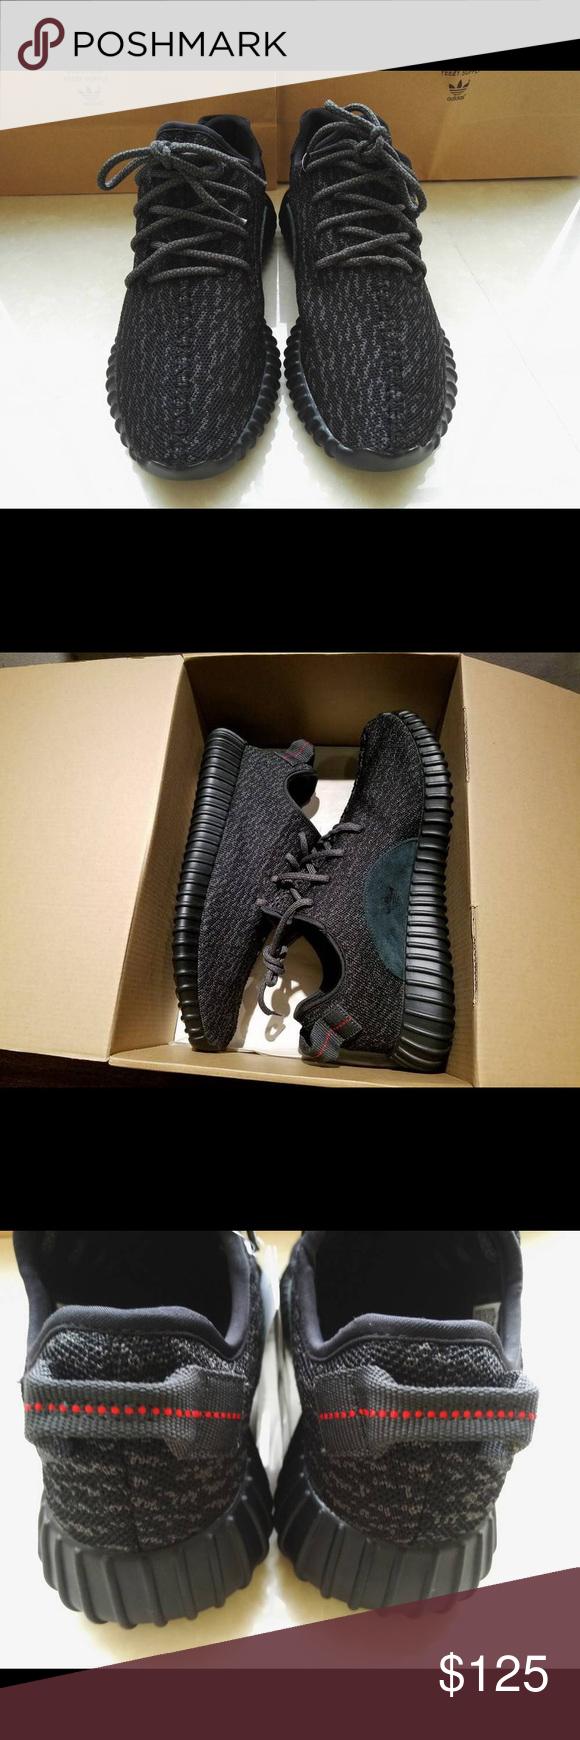 Adidas Yeezy Boost 350 vita